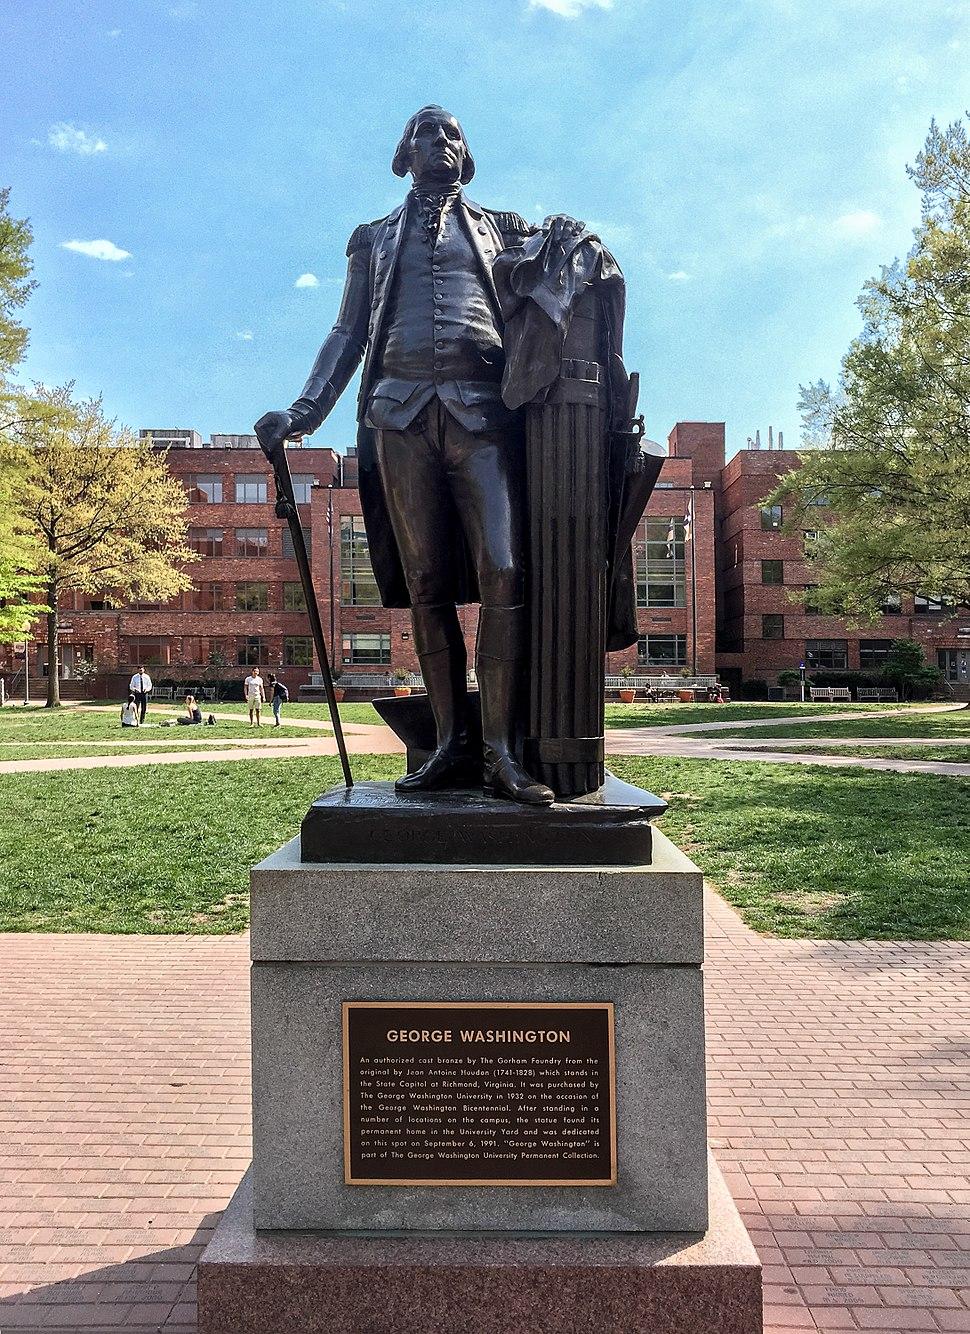 Statue of George Washington in University Yard, George Washington University